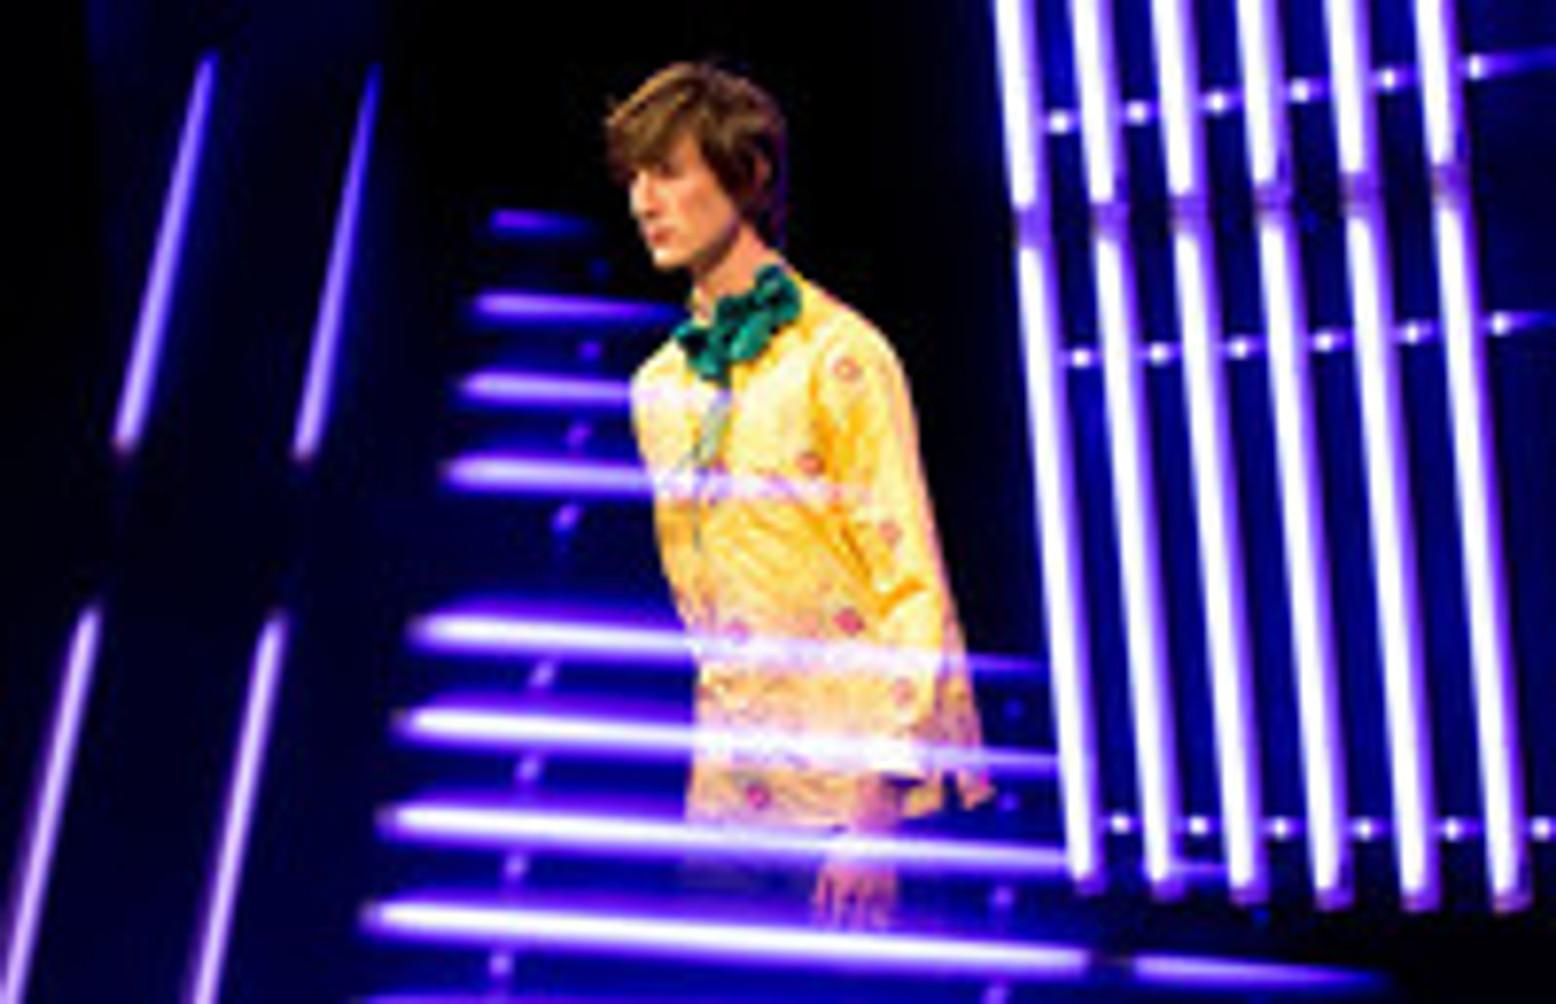 Fashion Week Illuminated | Amazing Lights in Fashion Shows